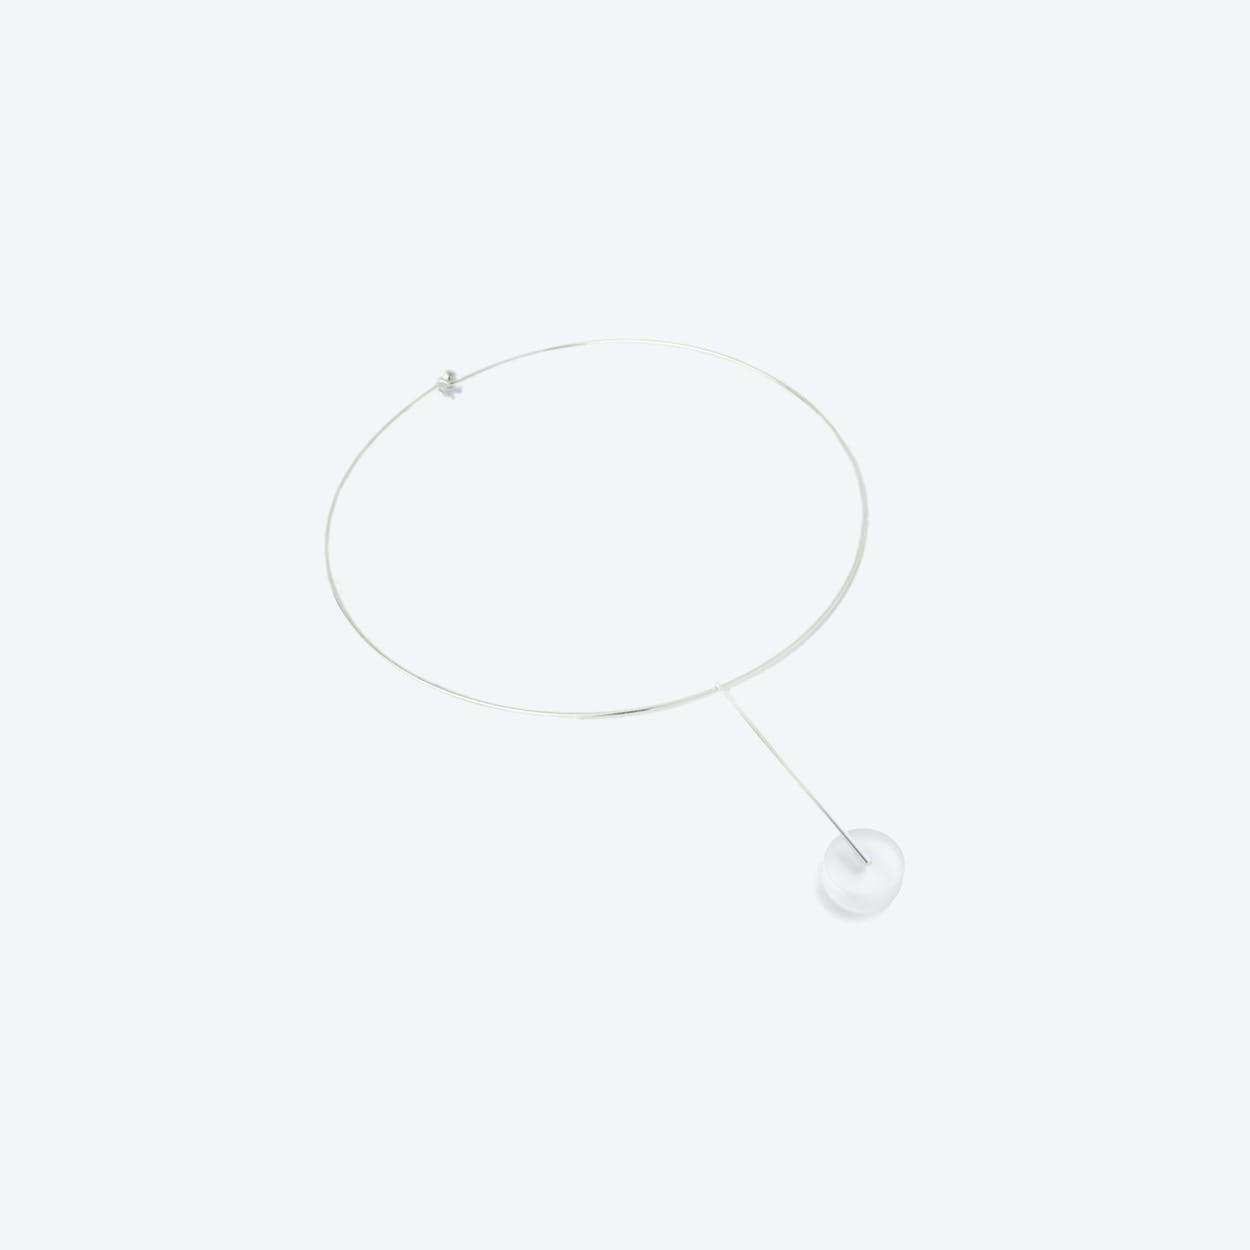 Kasia Choker Necklace Silver & Translucent